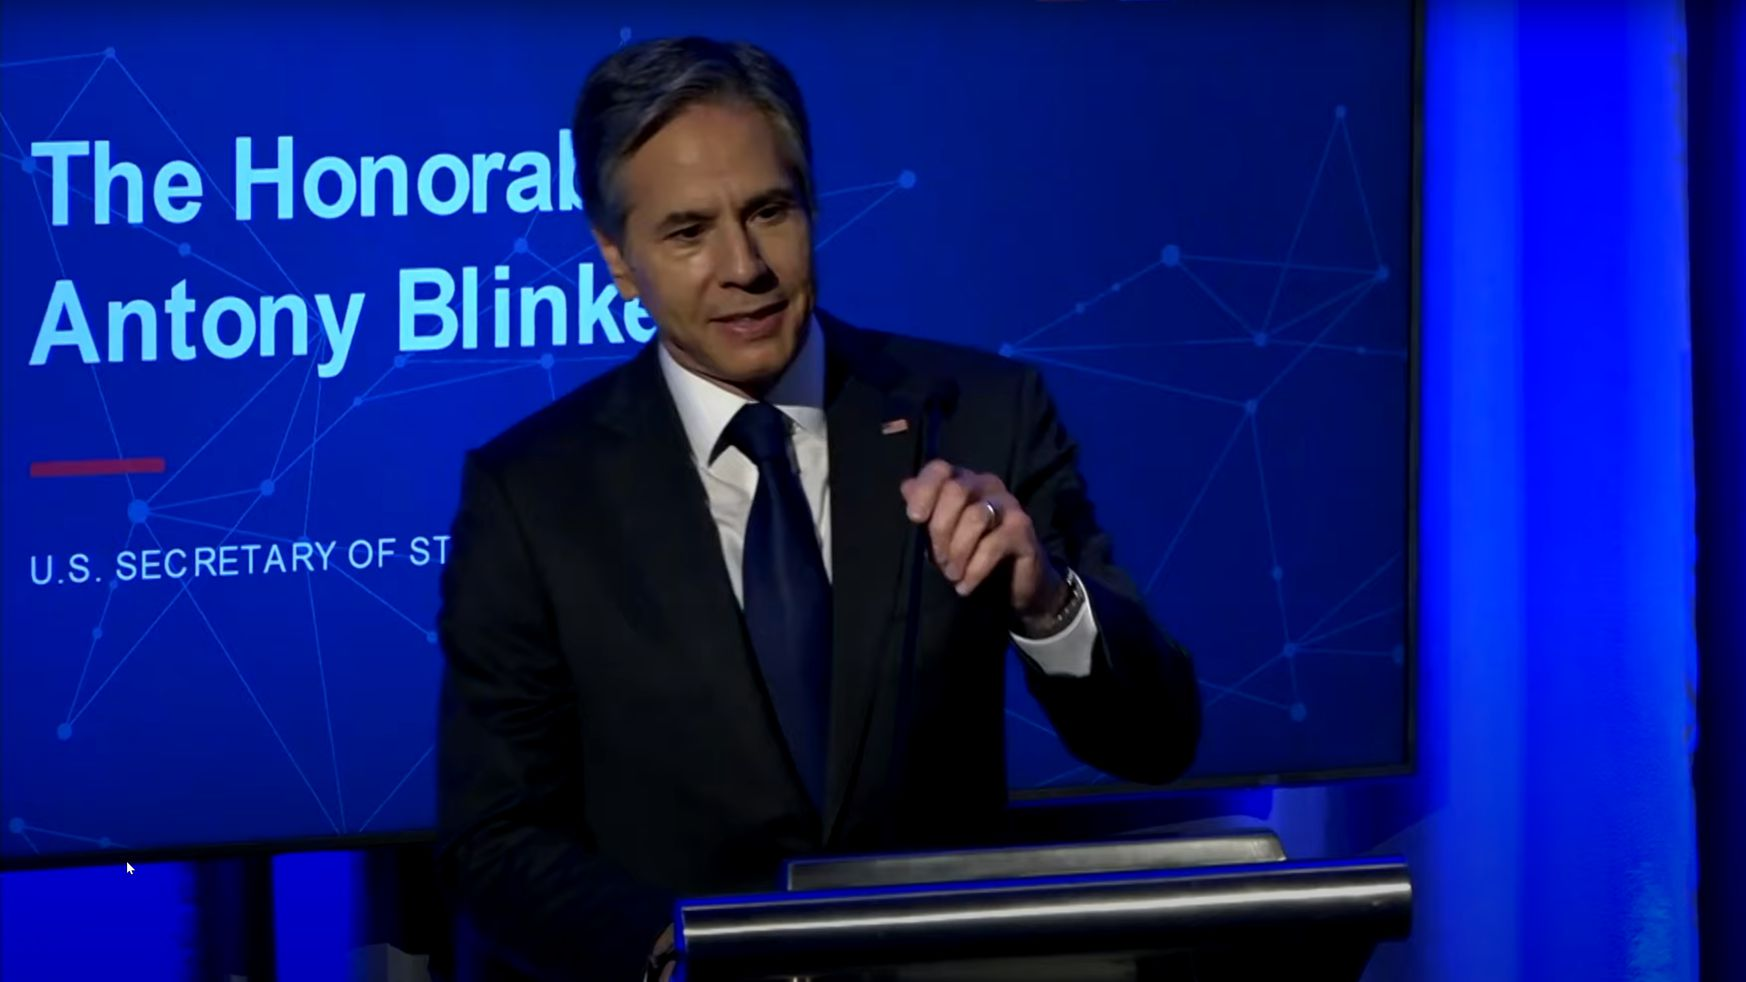 Antony Blinken NSCAI Global Emerging Technology Summit